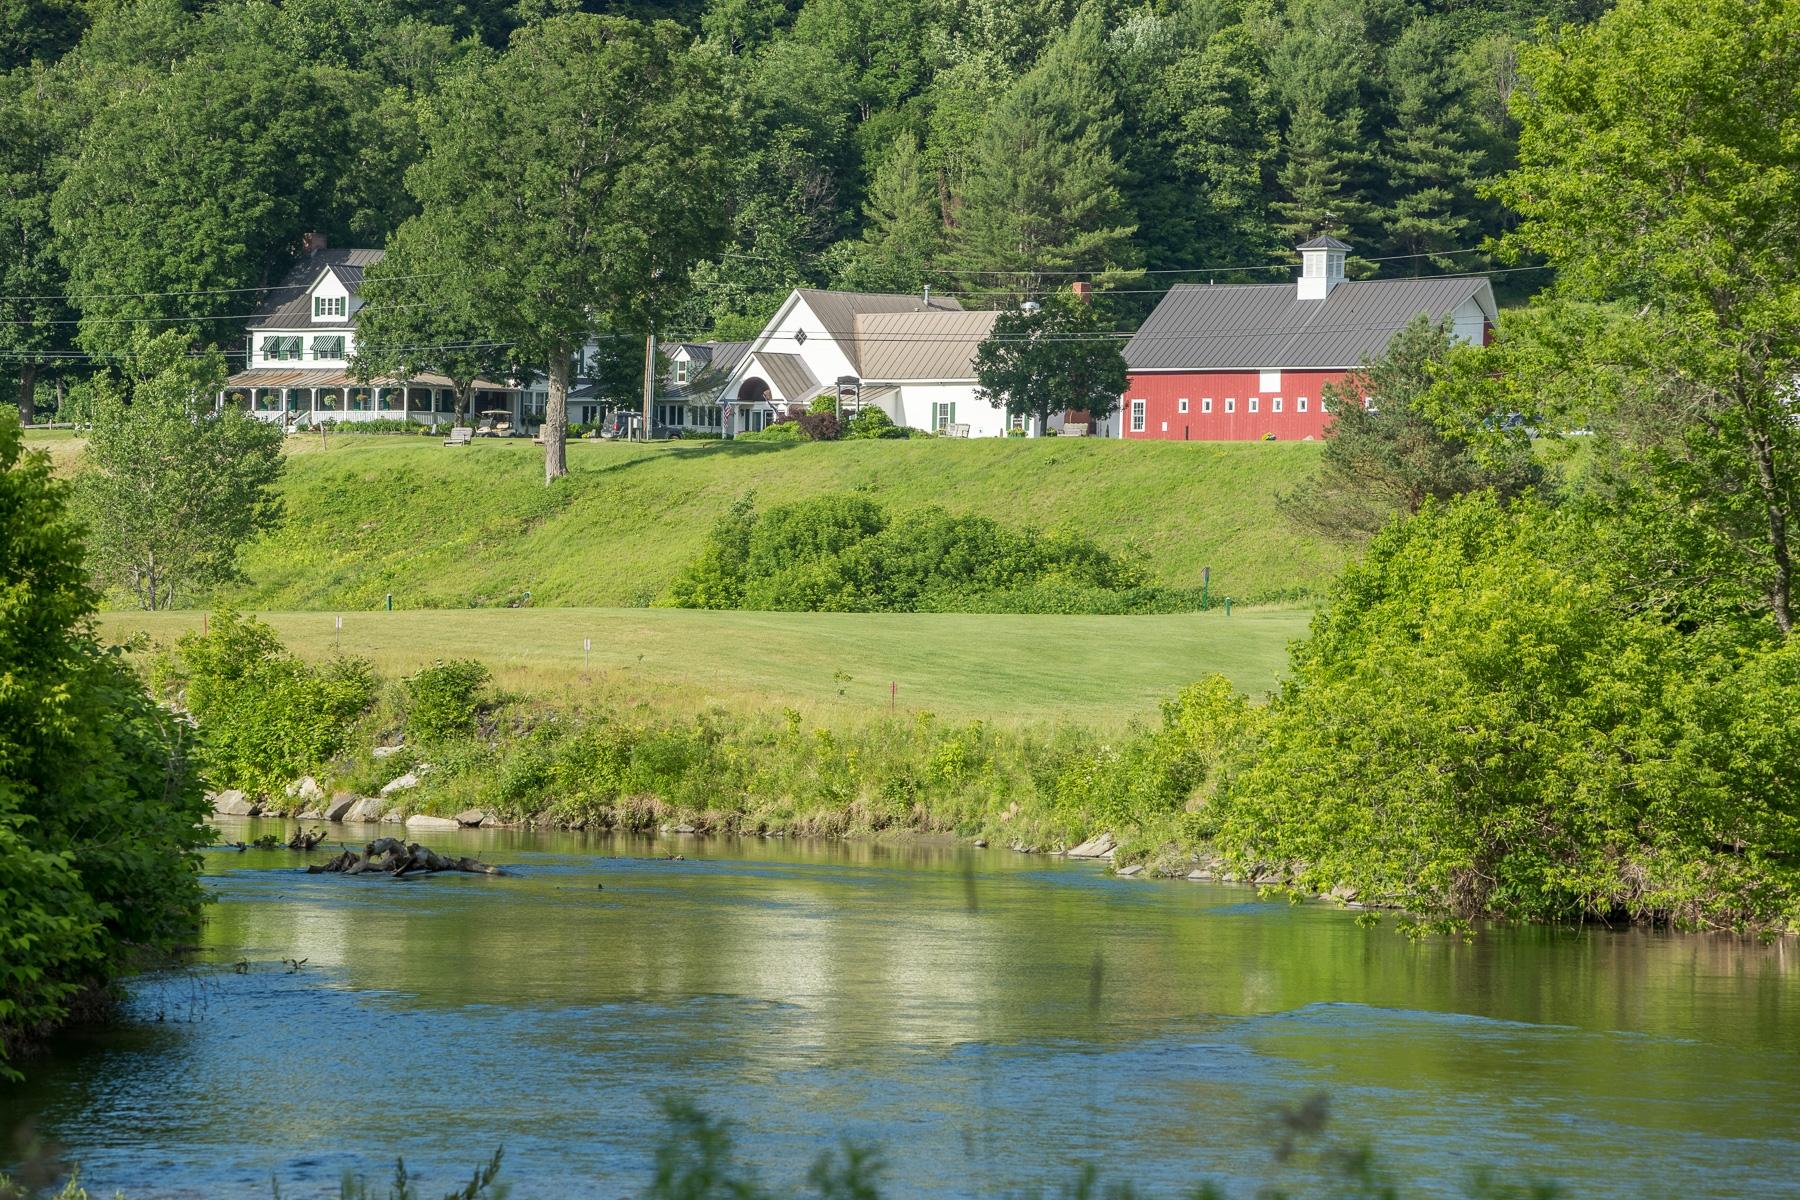 Single Family Home for Sale at 665 Stock Farm Road, Randolph 665 Stock Farm Rd Randolph, Vermont, 05060 United States